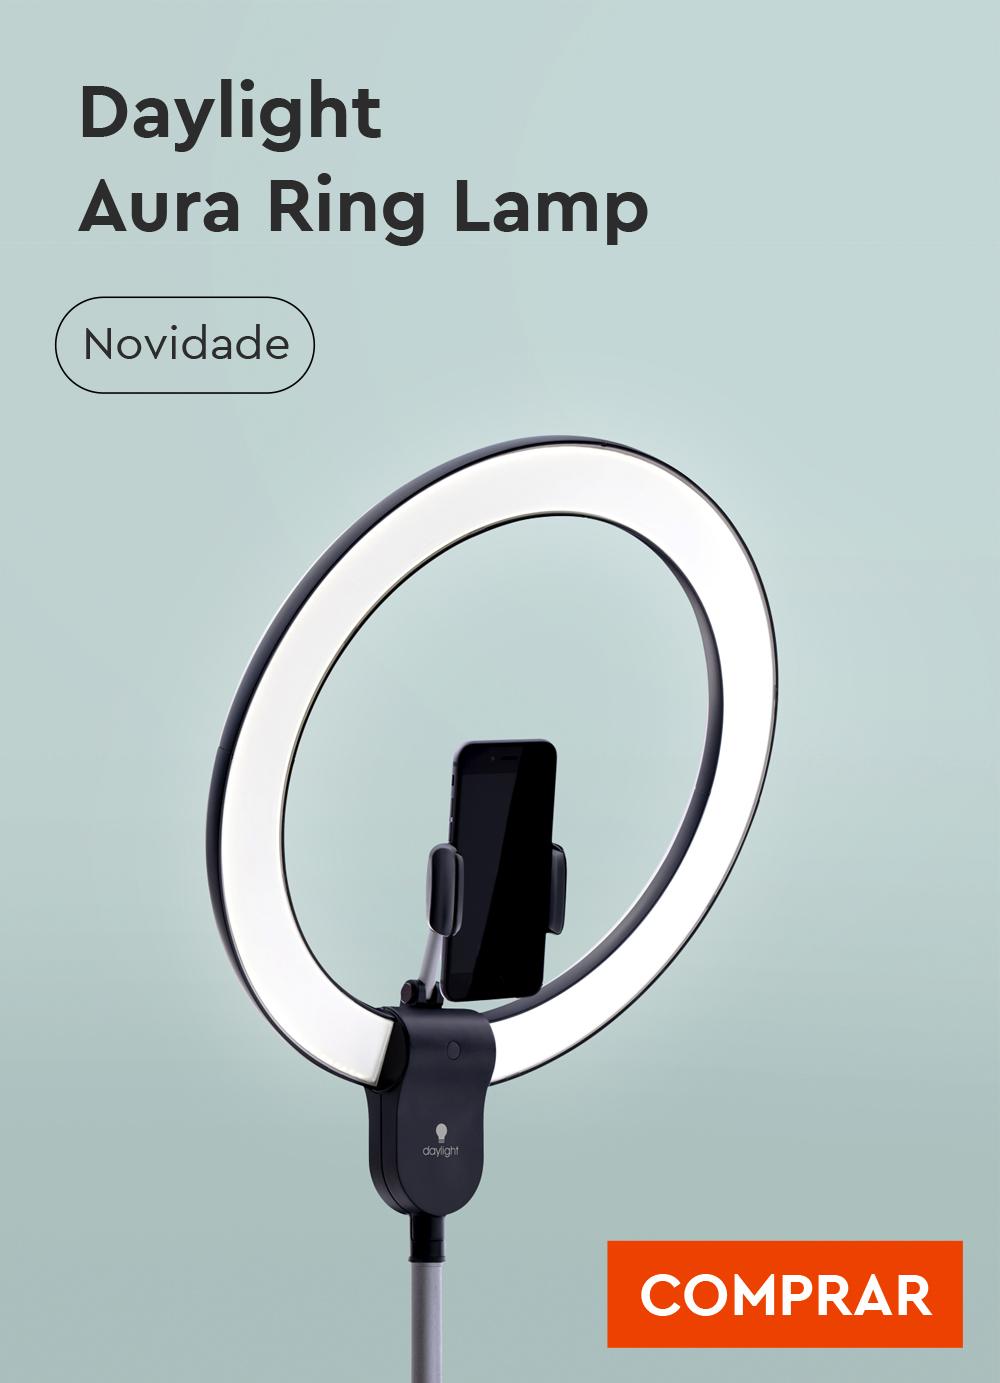 Daylight Aura Ring Lamp